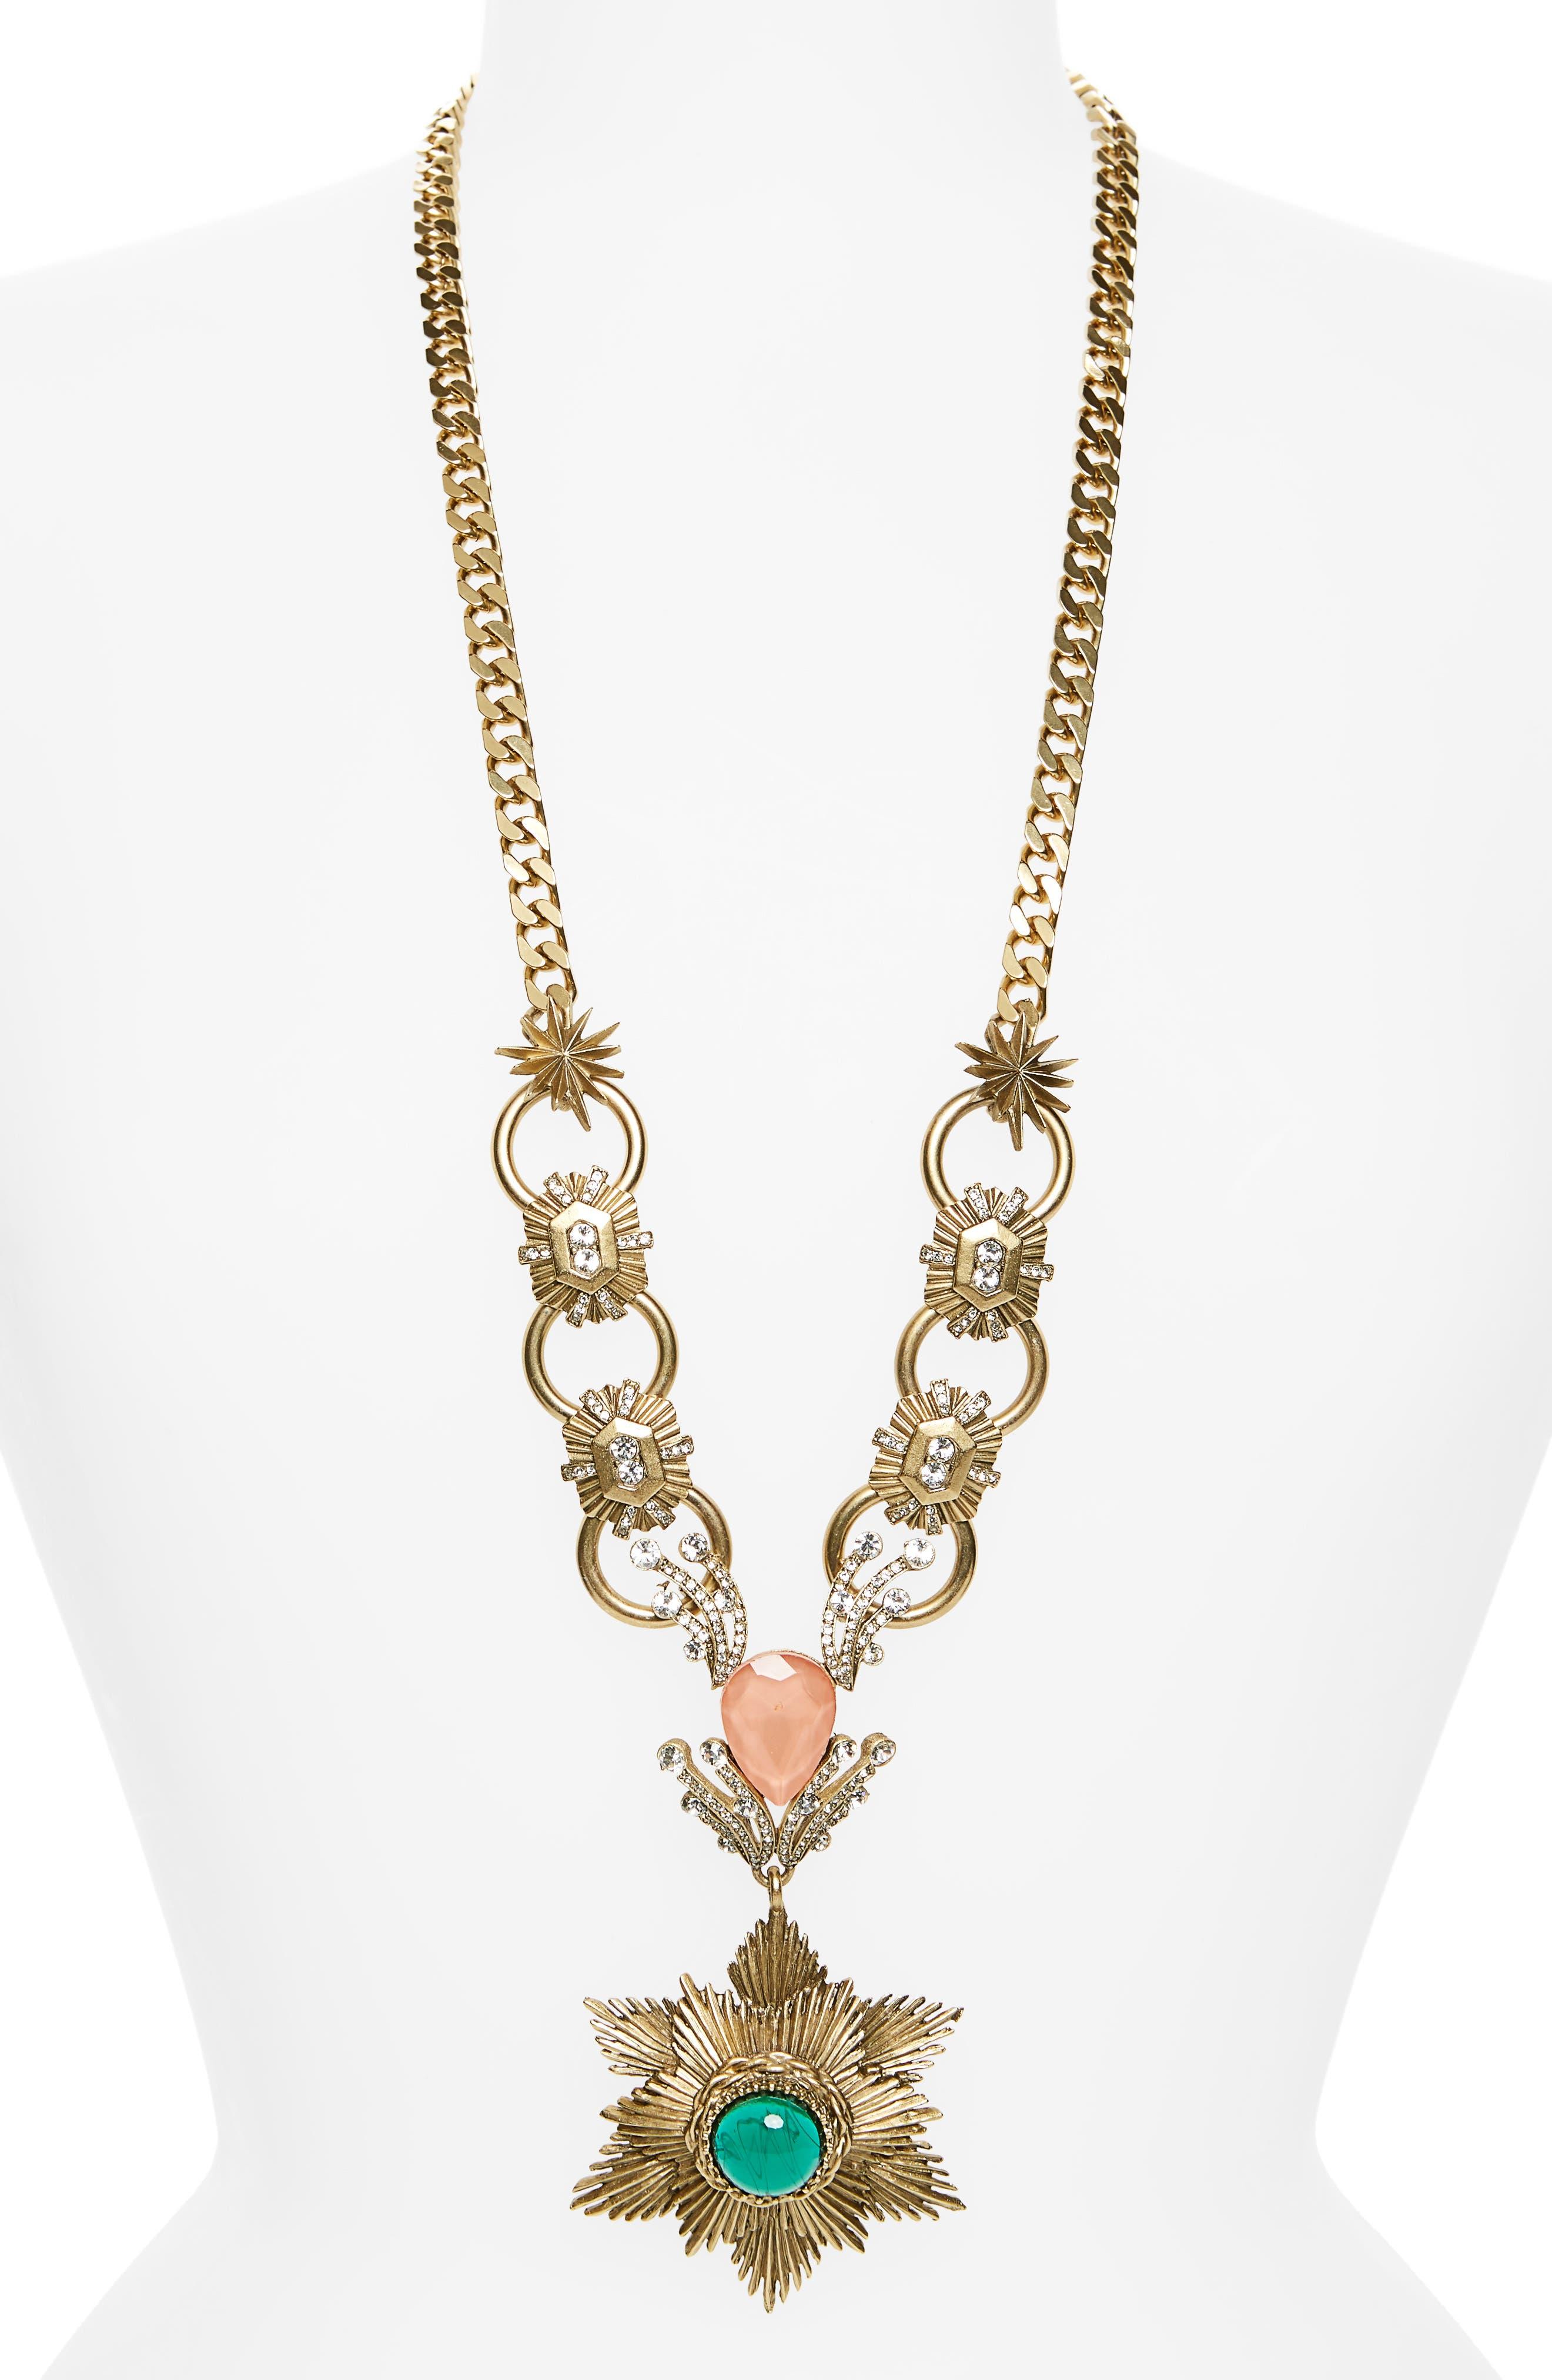 Main Image - Loren Hope Gloria Pendant Necklace